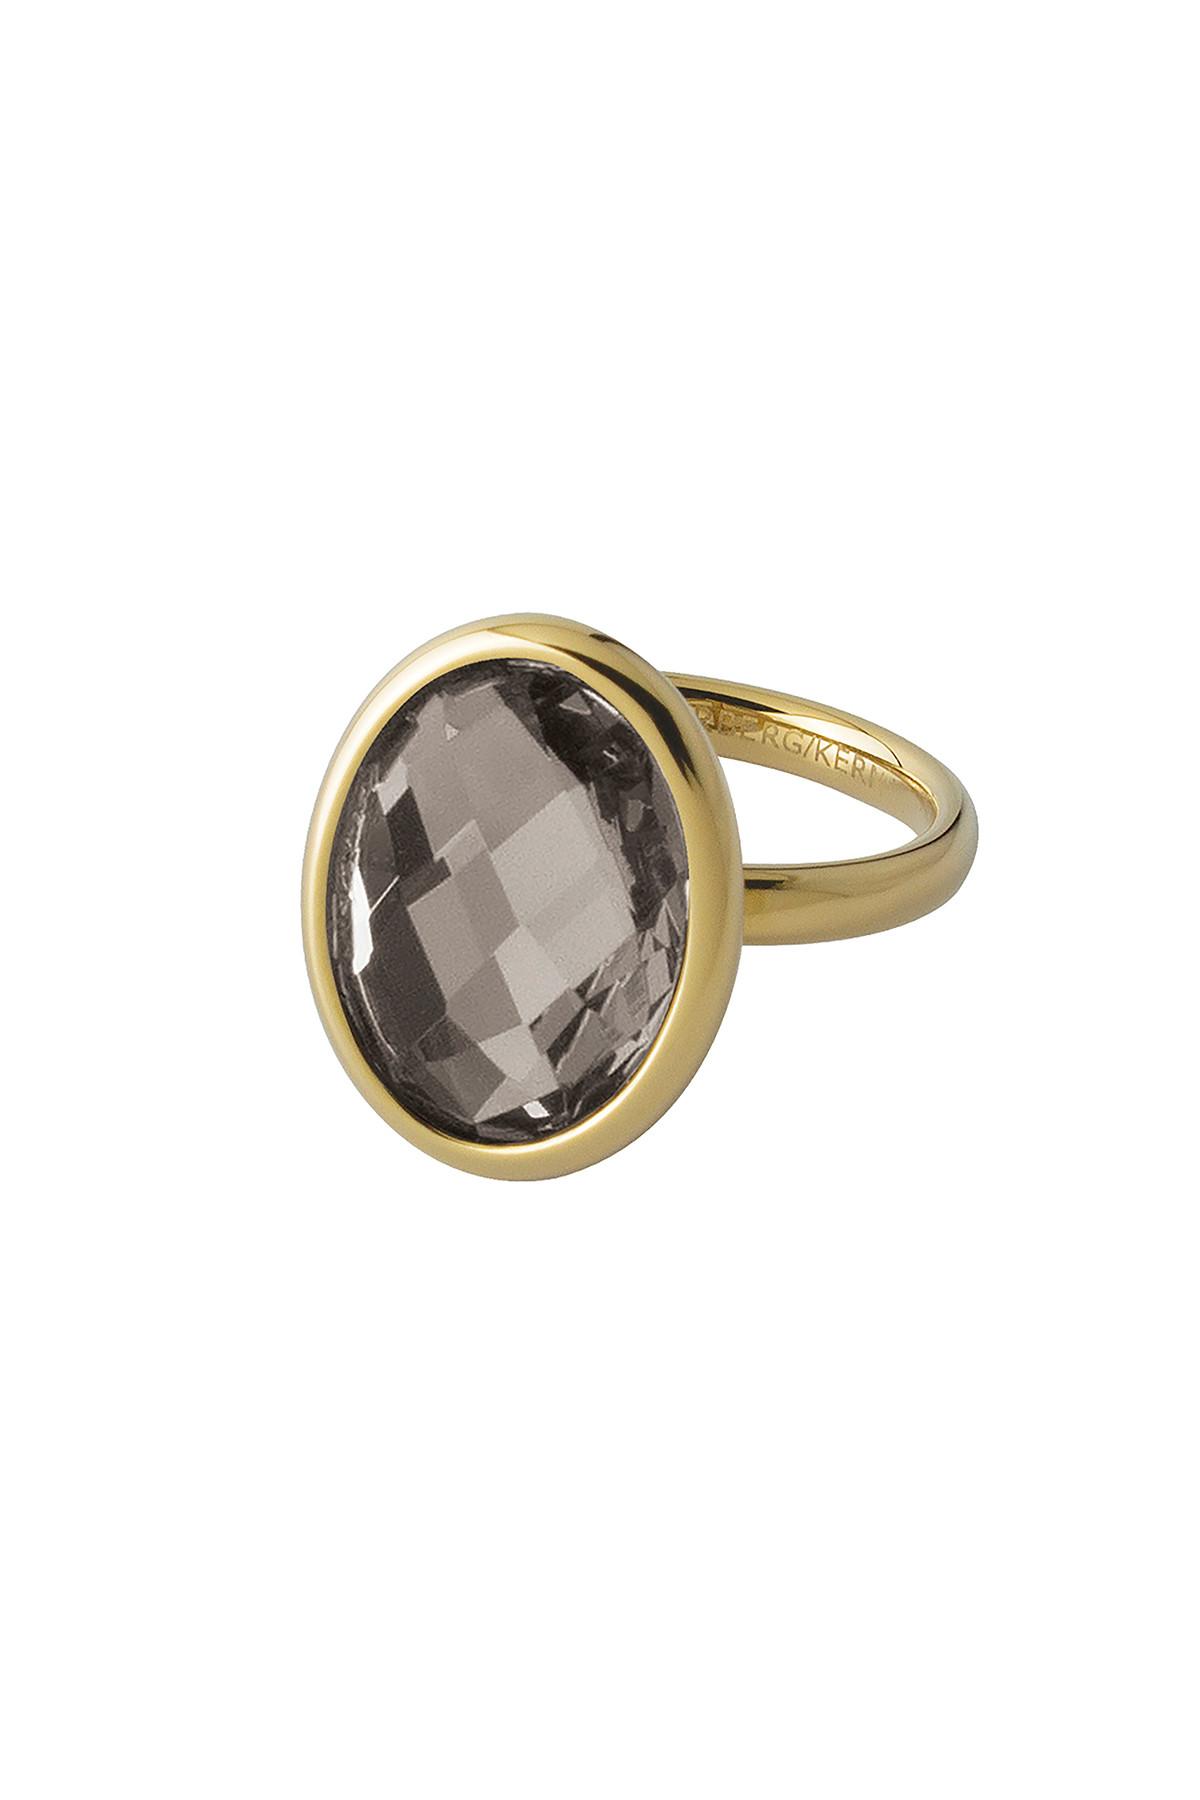 Image of   DYRBERG/KERN RHODA RING 352012 (Gold, Sand, III/57)